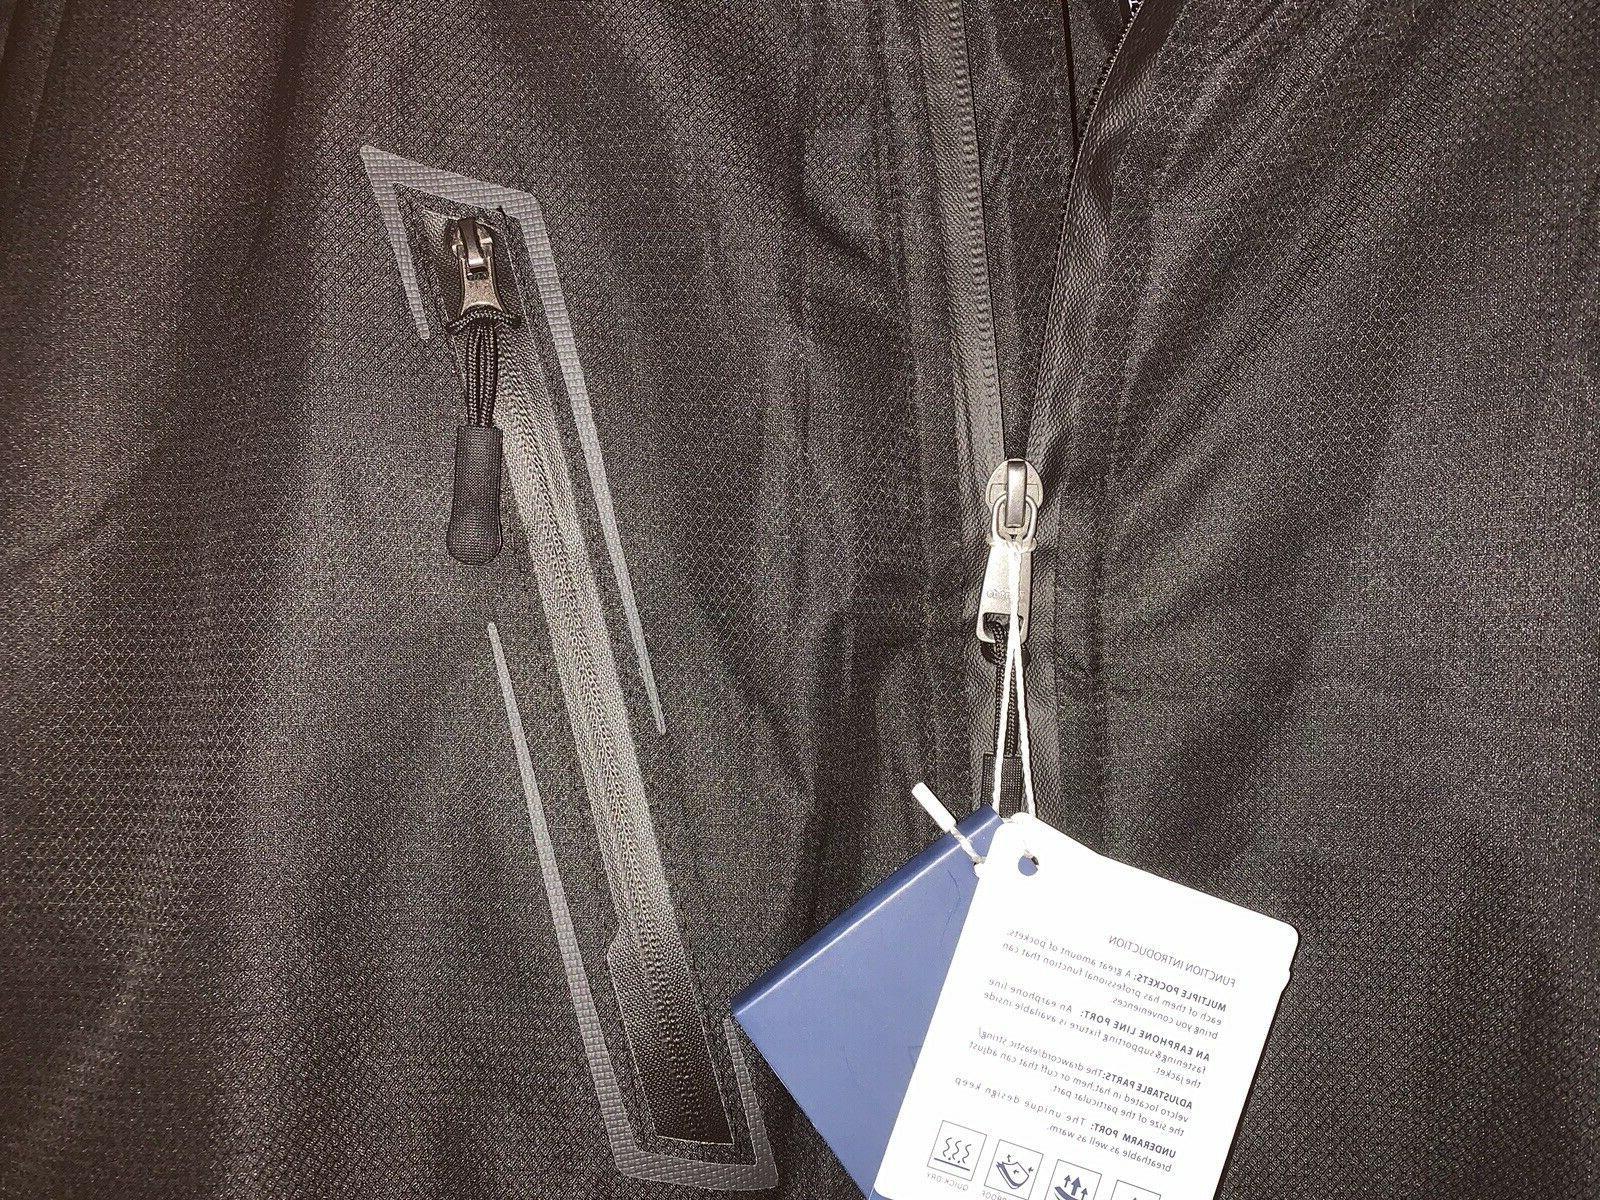 NWT Waterproof Fleece Windproof Parka Coat XL Black